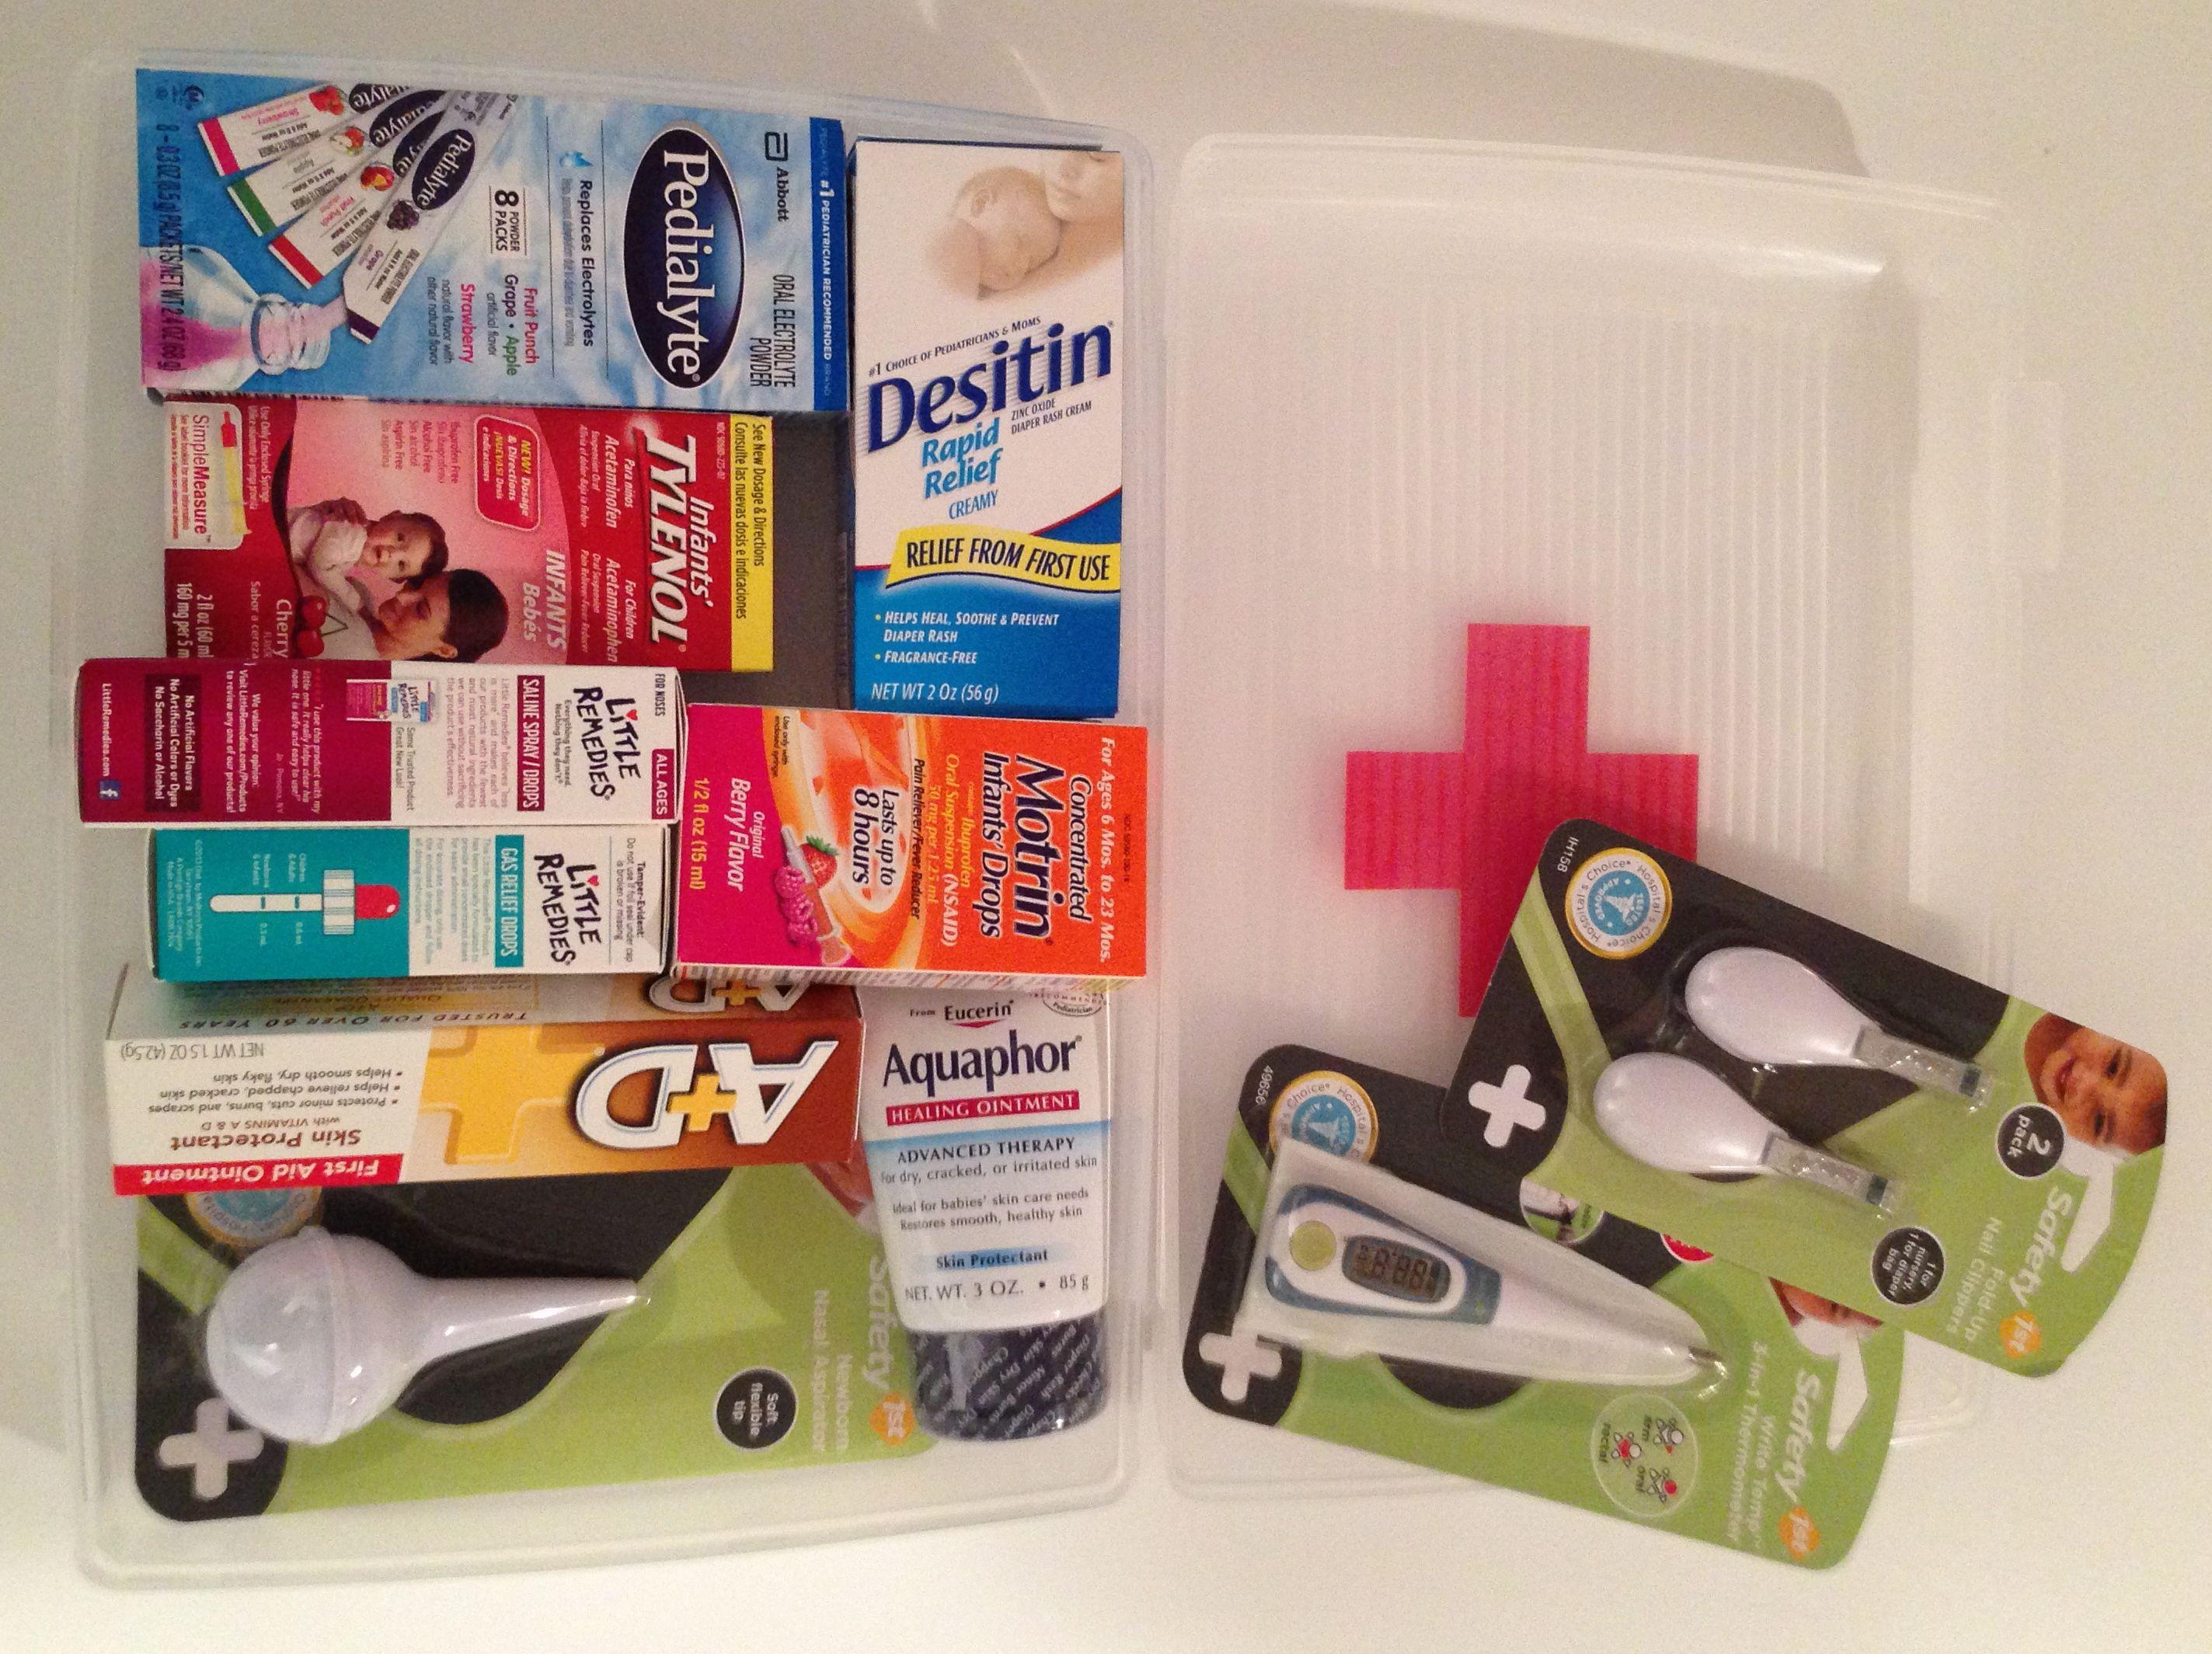 Our Diy Baby Shower Gifts Newborn First Aid Kit Diy Baby Shower Gifts Thoughtful Baby Shower Gifts Diy Baby Stuff